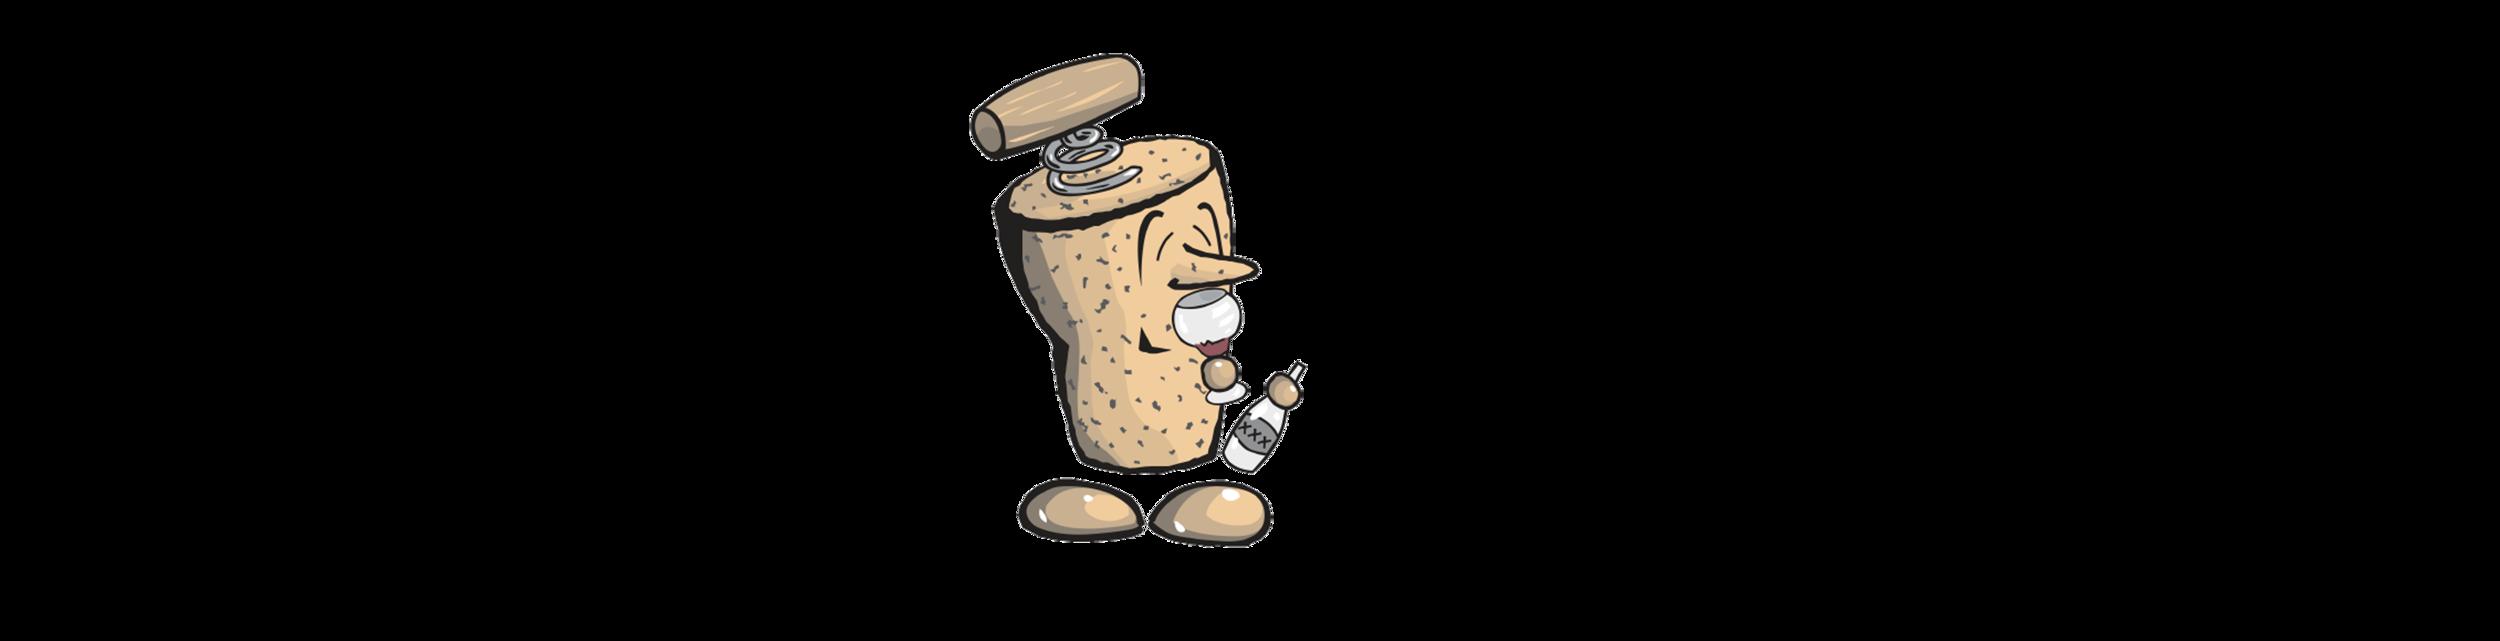 Corkdorks Logo 2018 BothLocations.png